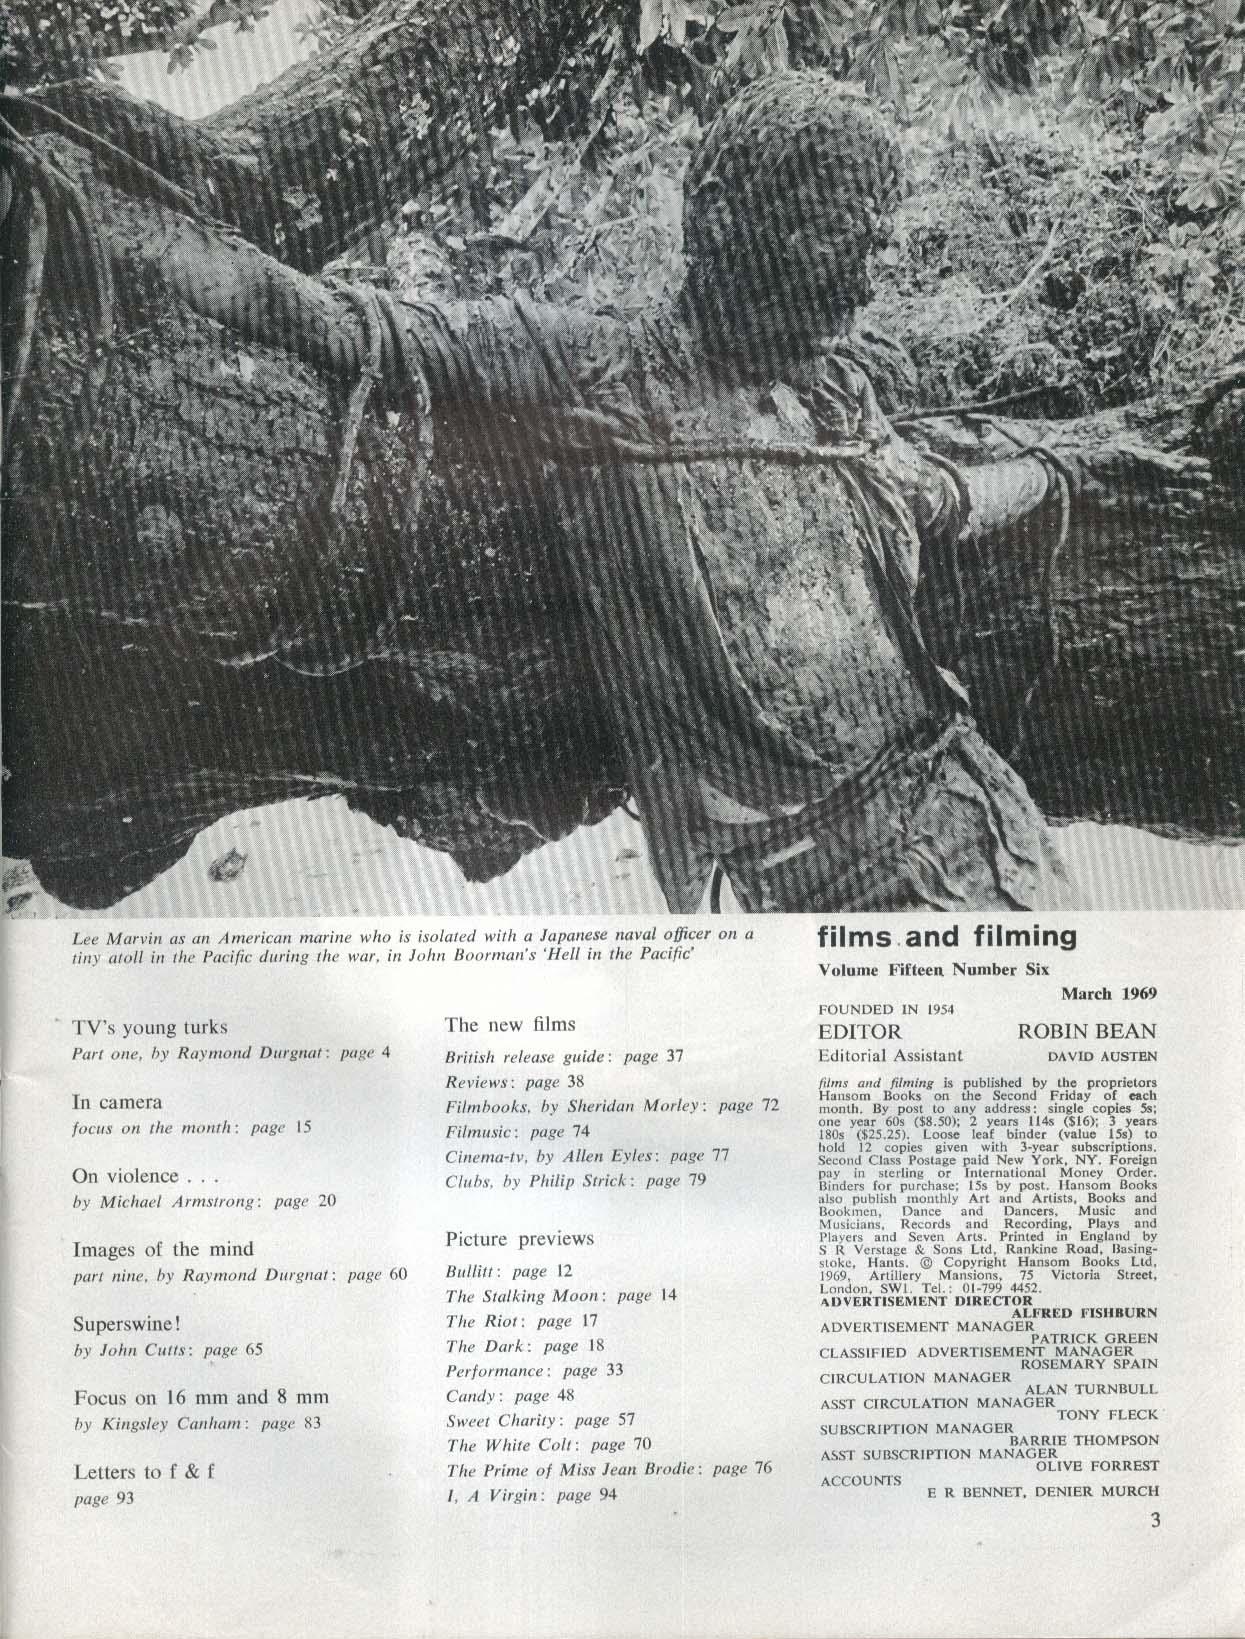 FILMS & FILMING Performance James Fox Brando Bonnie Clyde Wild Angels + 3 1969